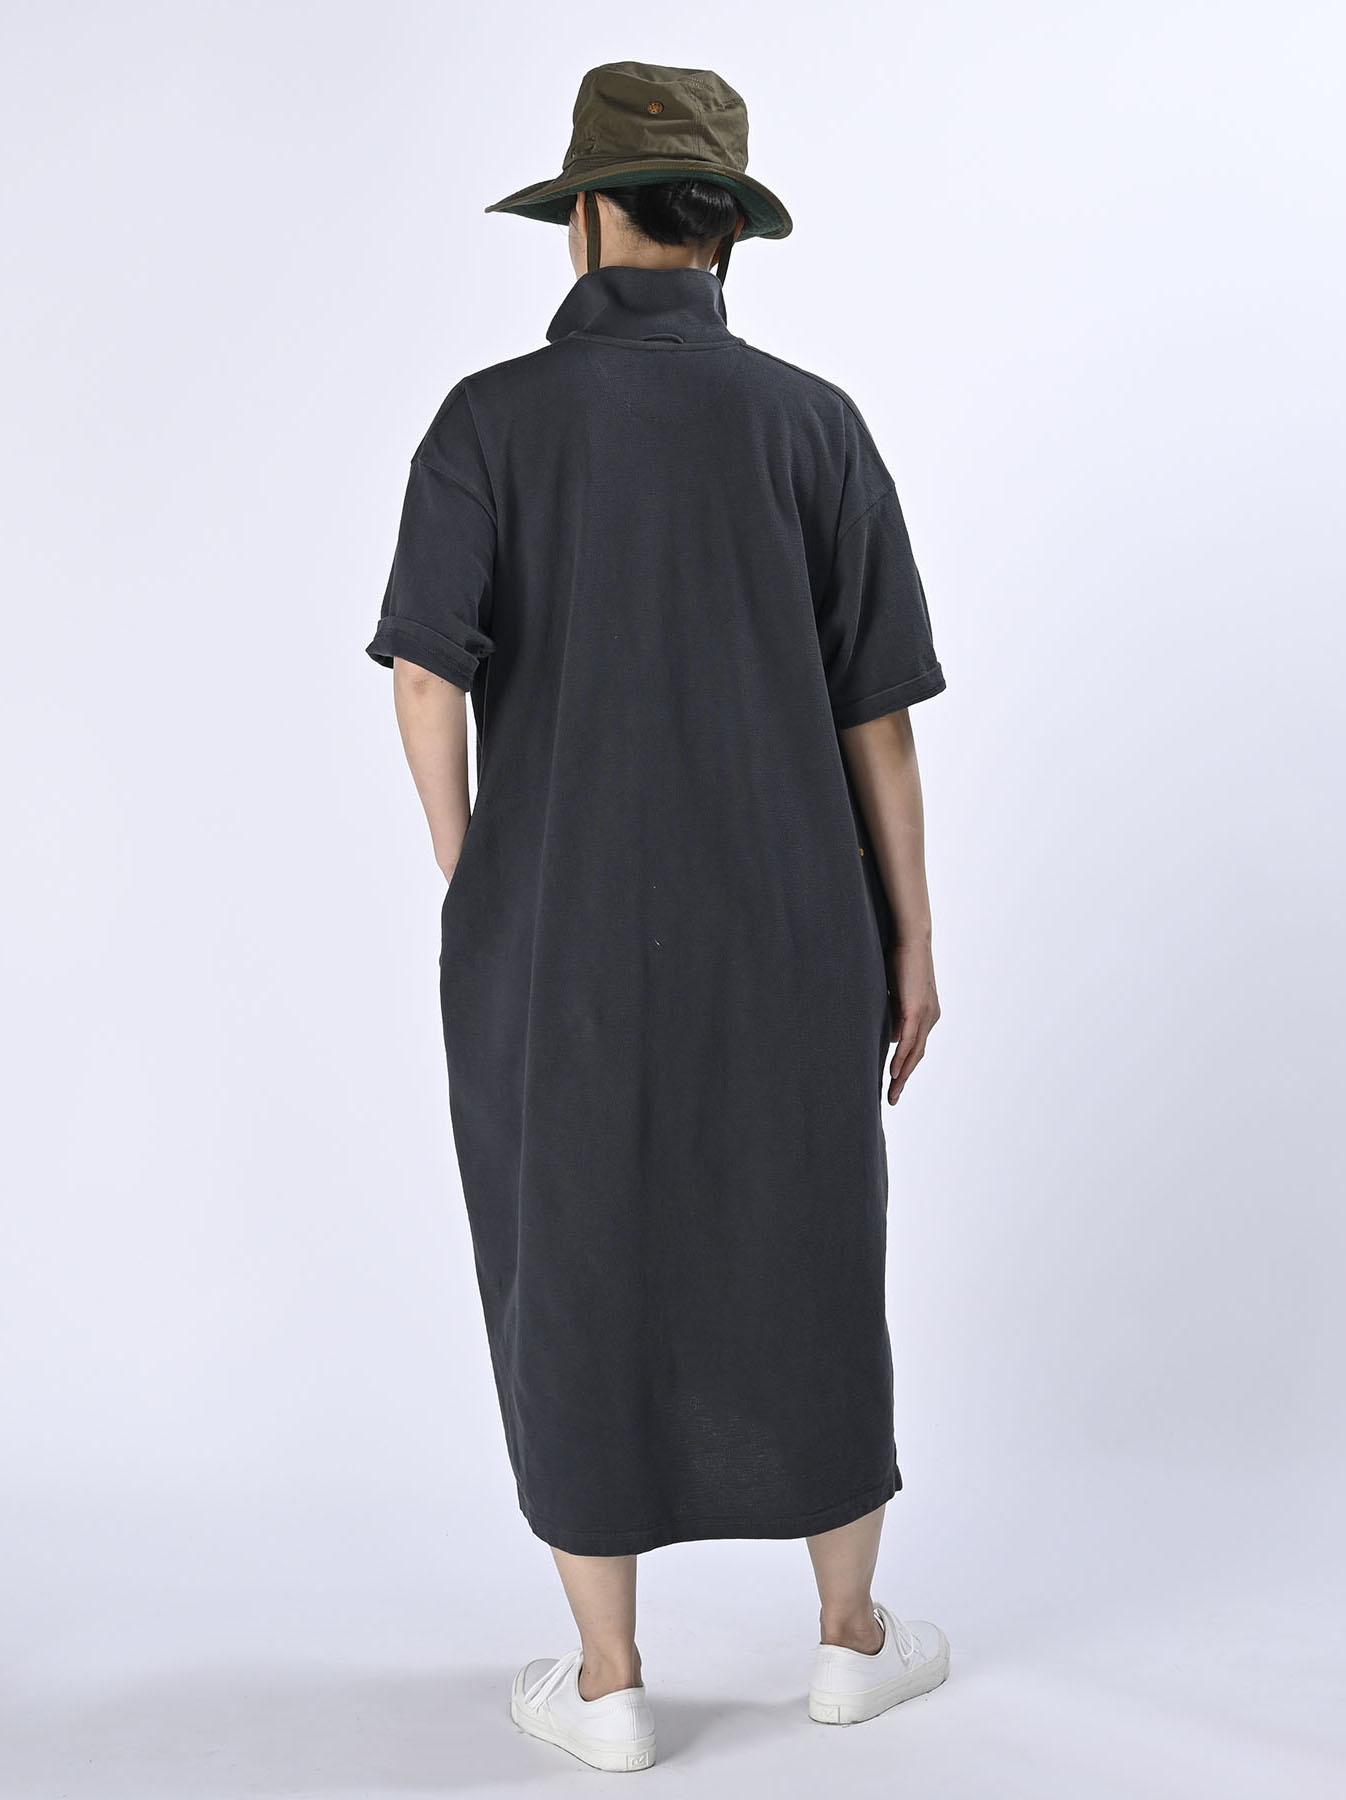 Kanoko Ocean Shiokaze Short-sleeved Polo Dress (0521)-4